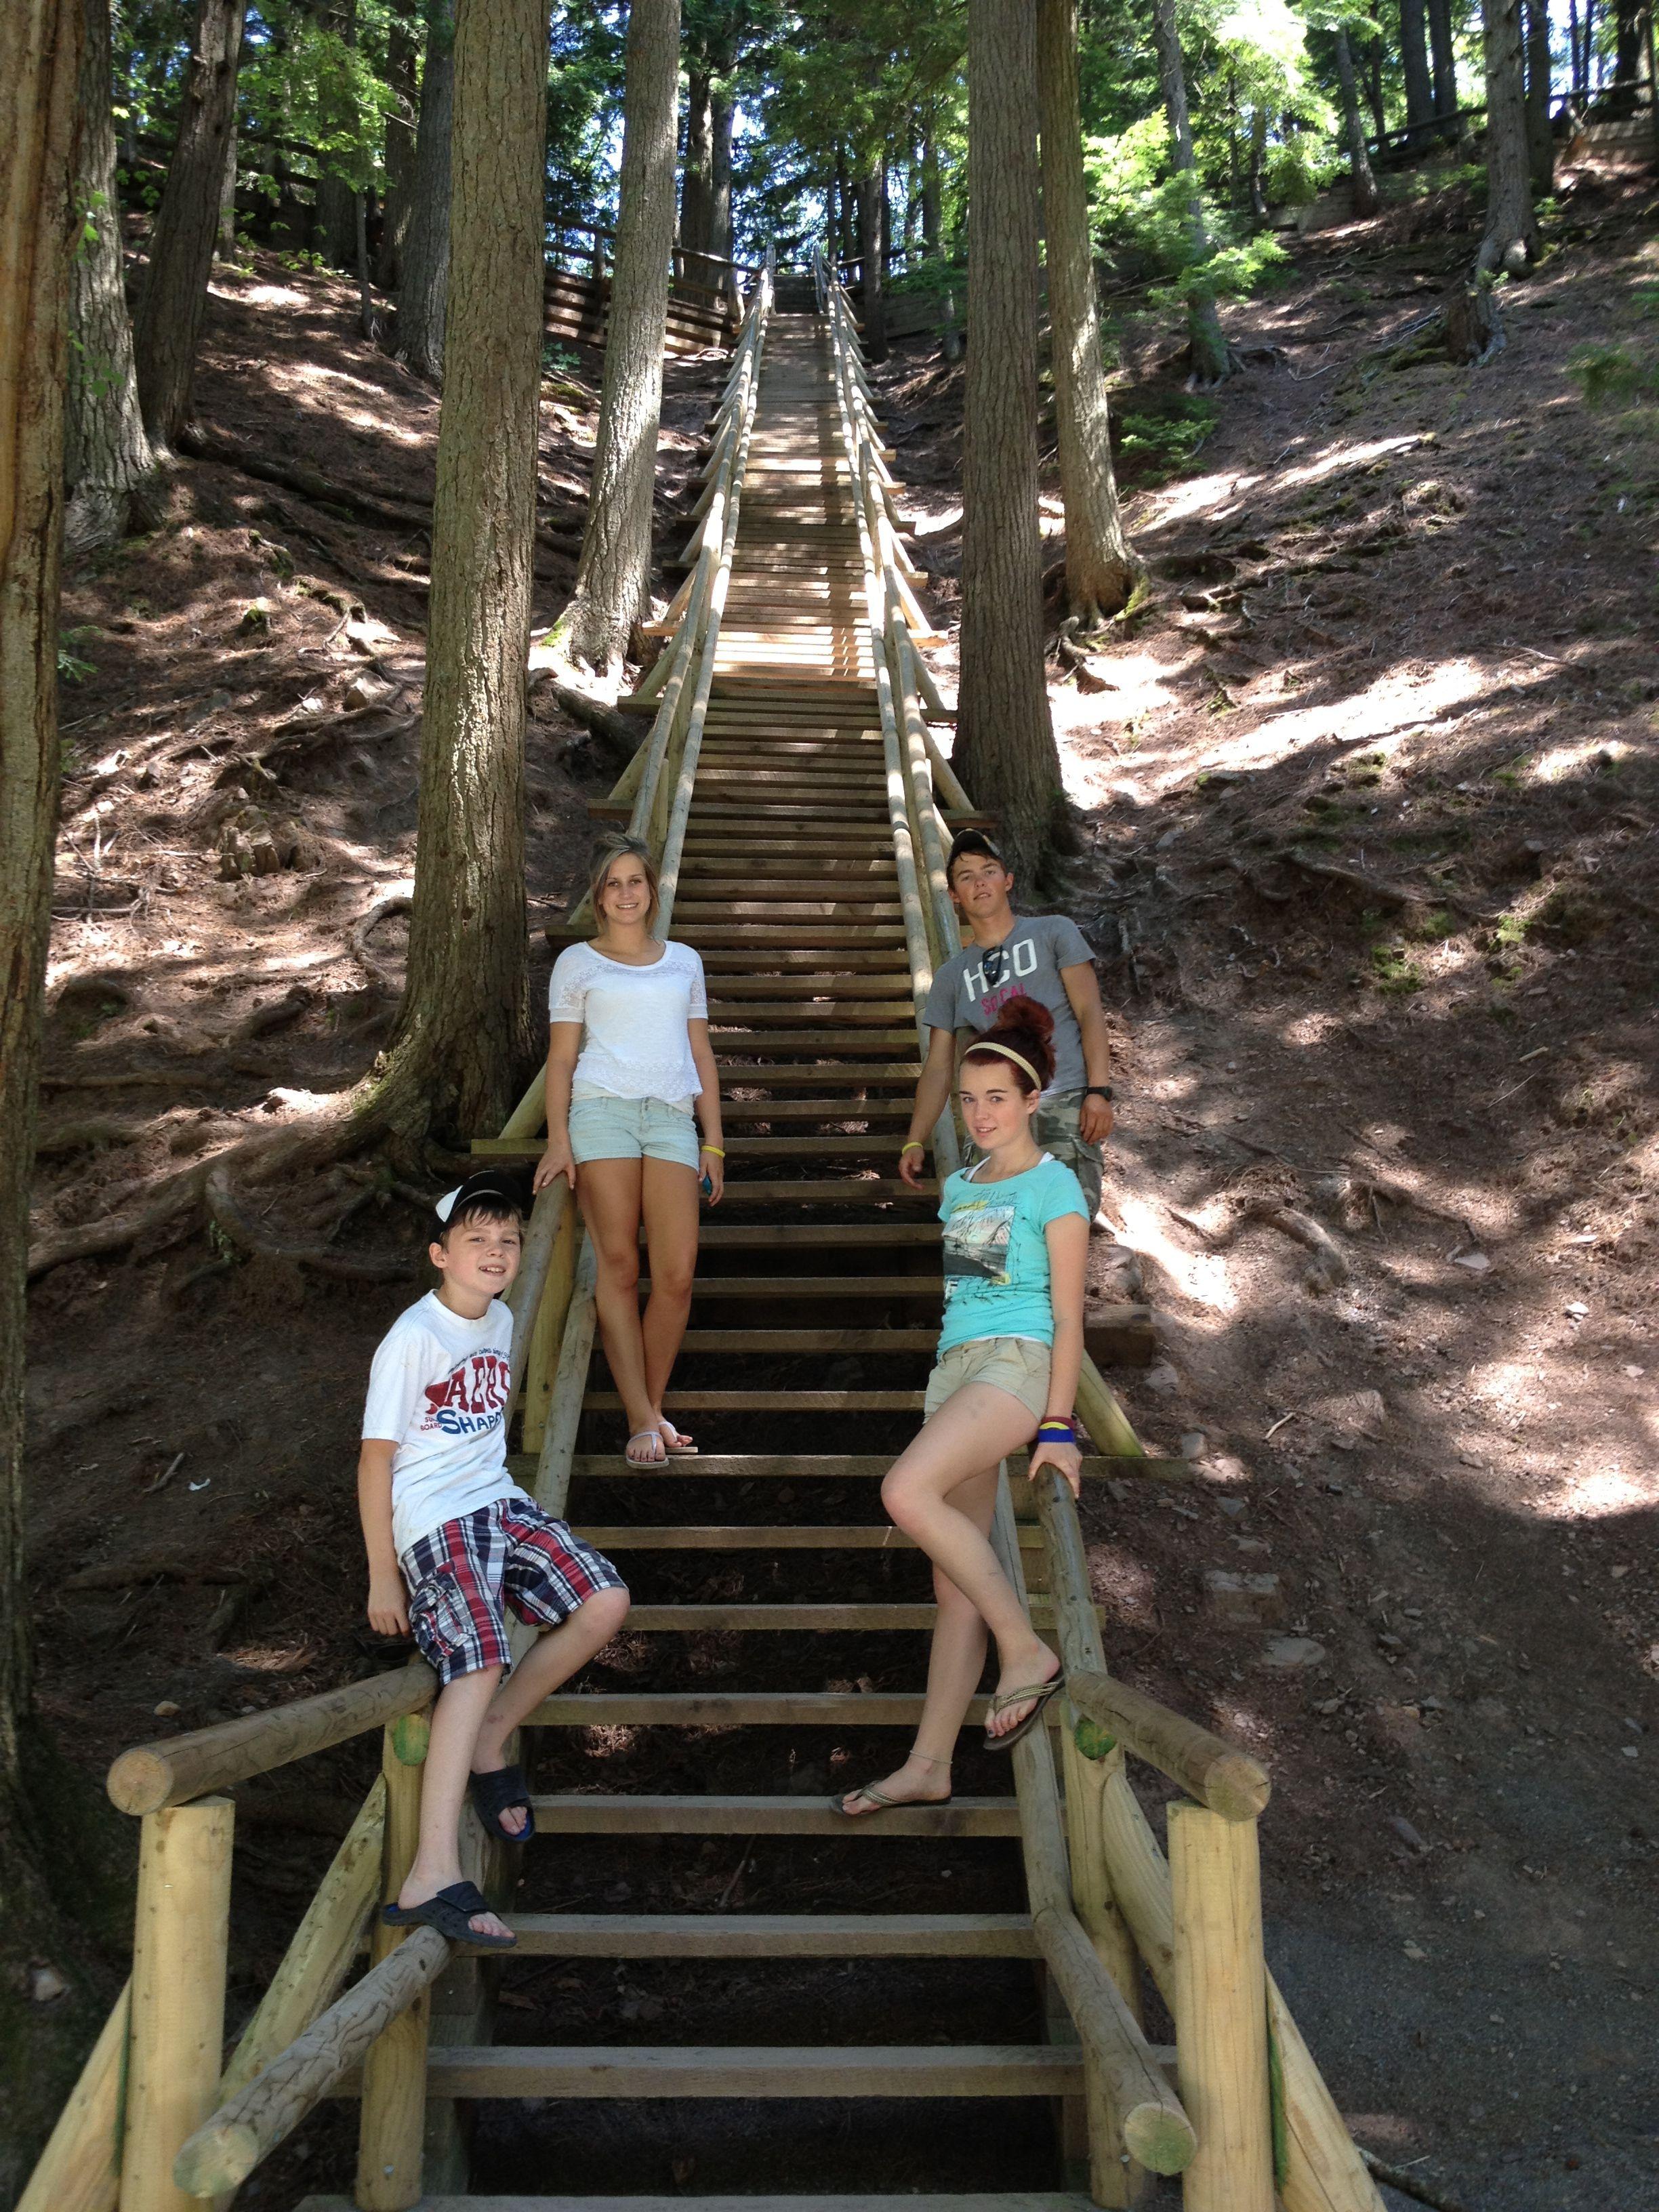 Jacob\'s Ladder - Victoria Park, Truro, NS 179 steps I believe ...